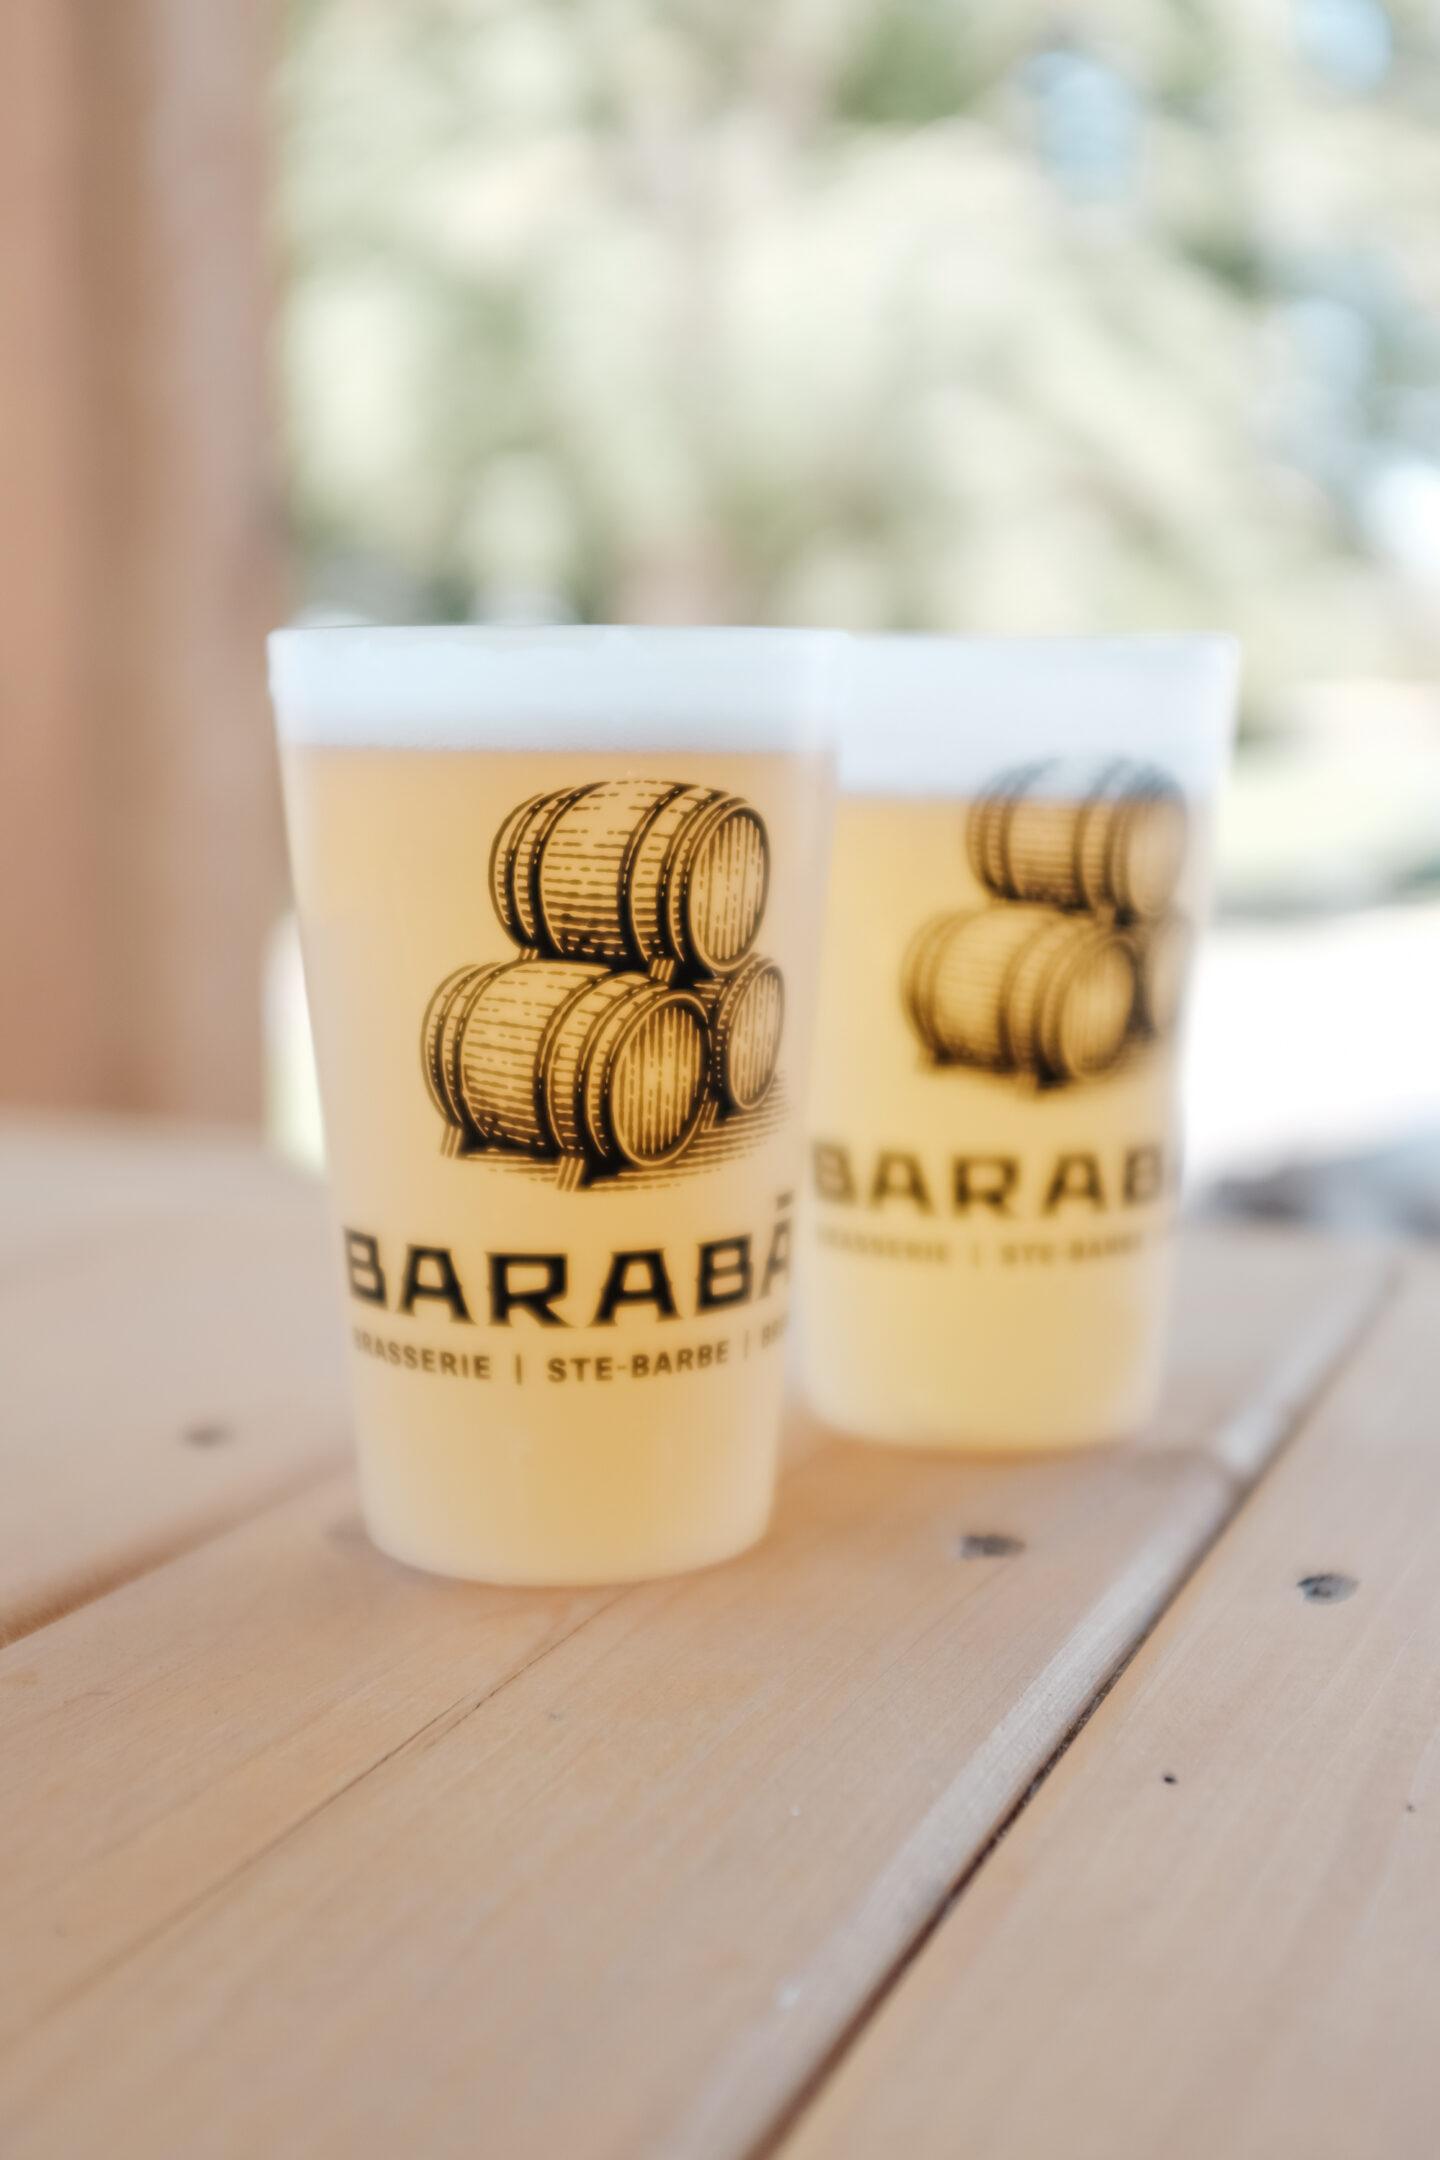 Barabe Microbrasserie